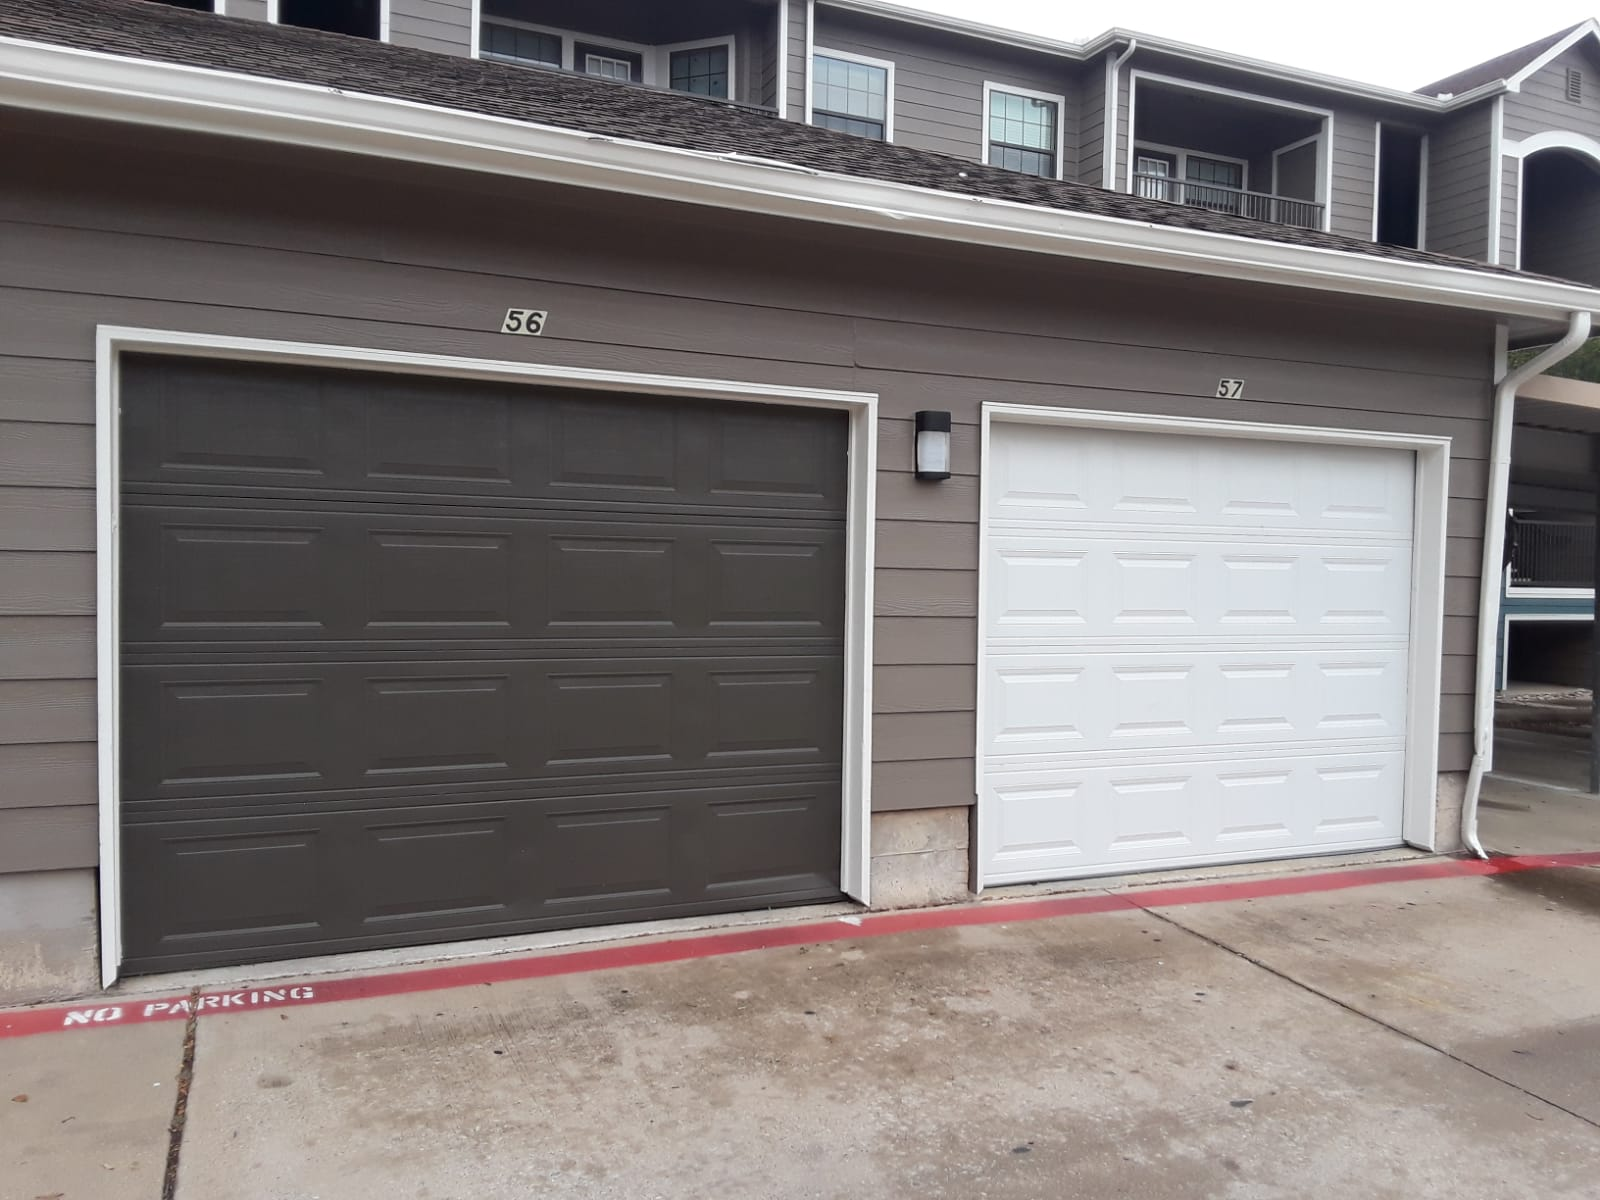 New Garage Door Installation For A Single Car Garage Dallas Tx Metro Garage Door Repair Dallas Tx